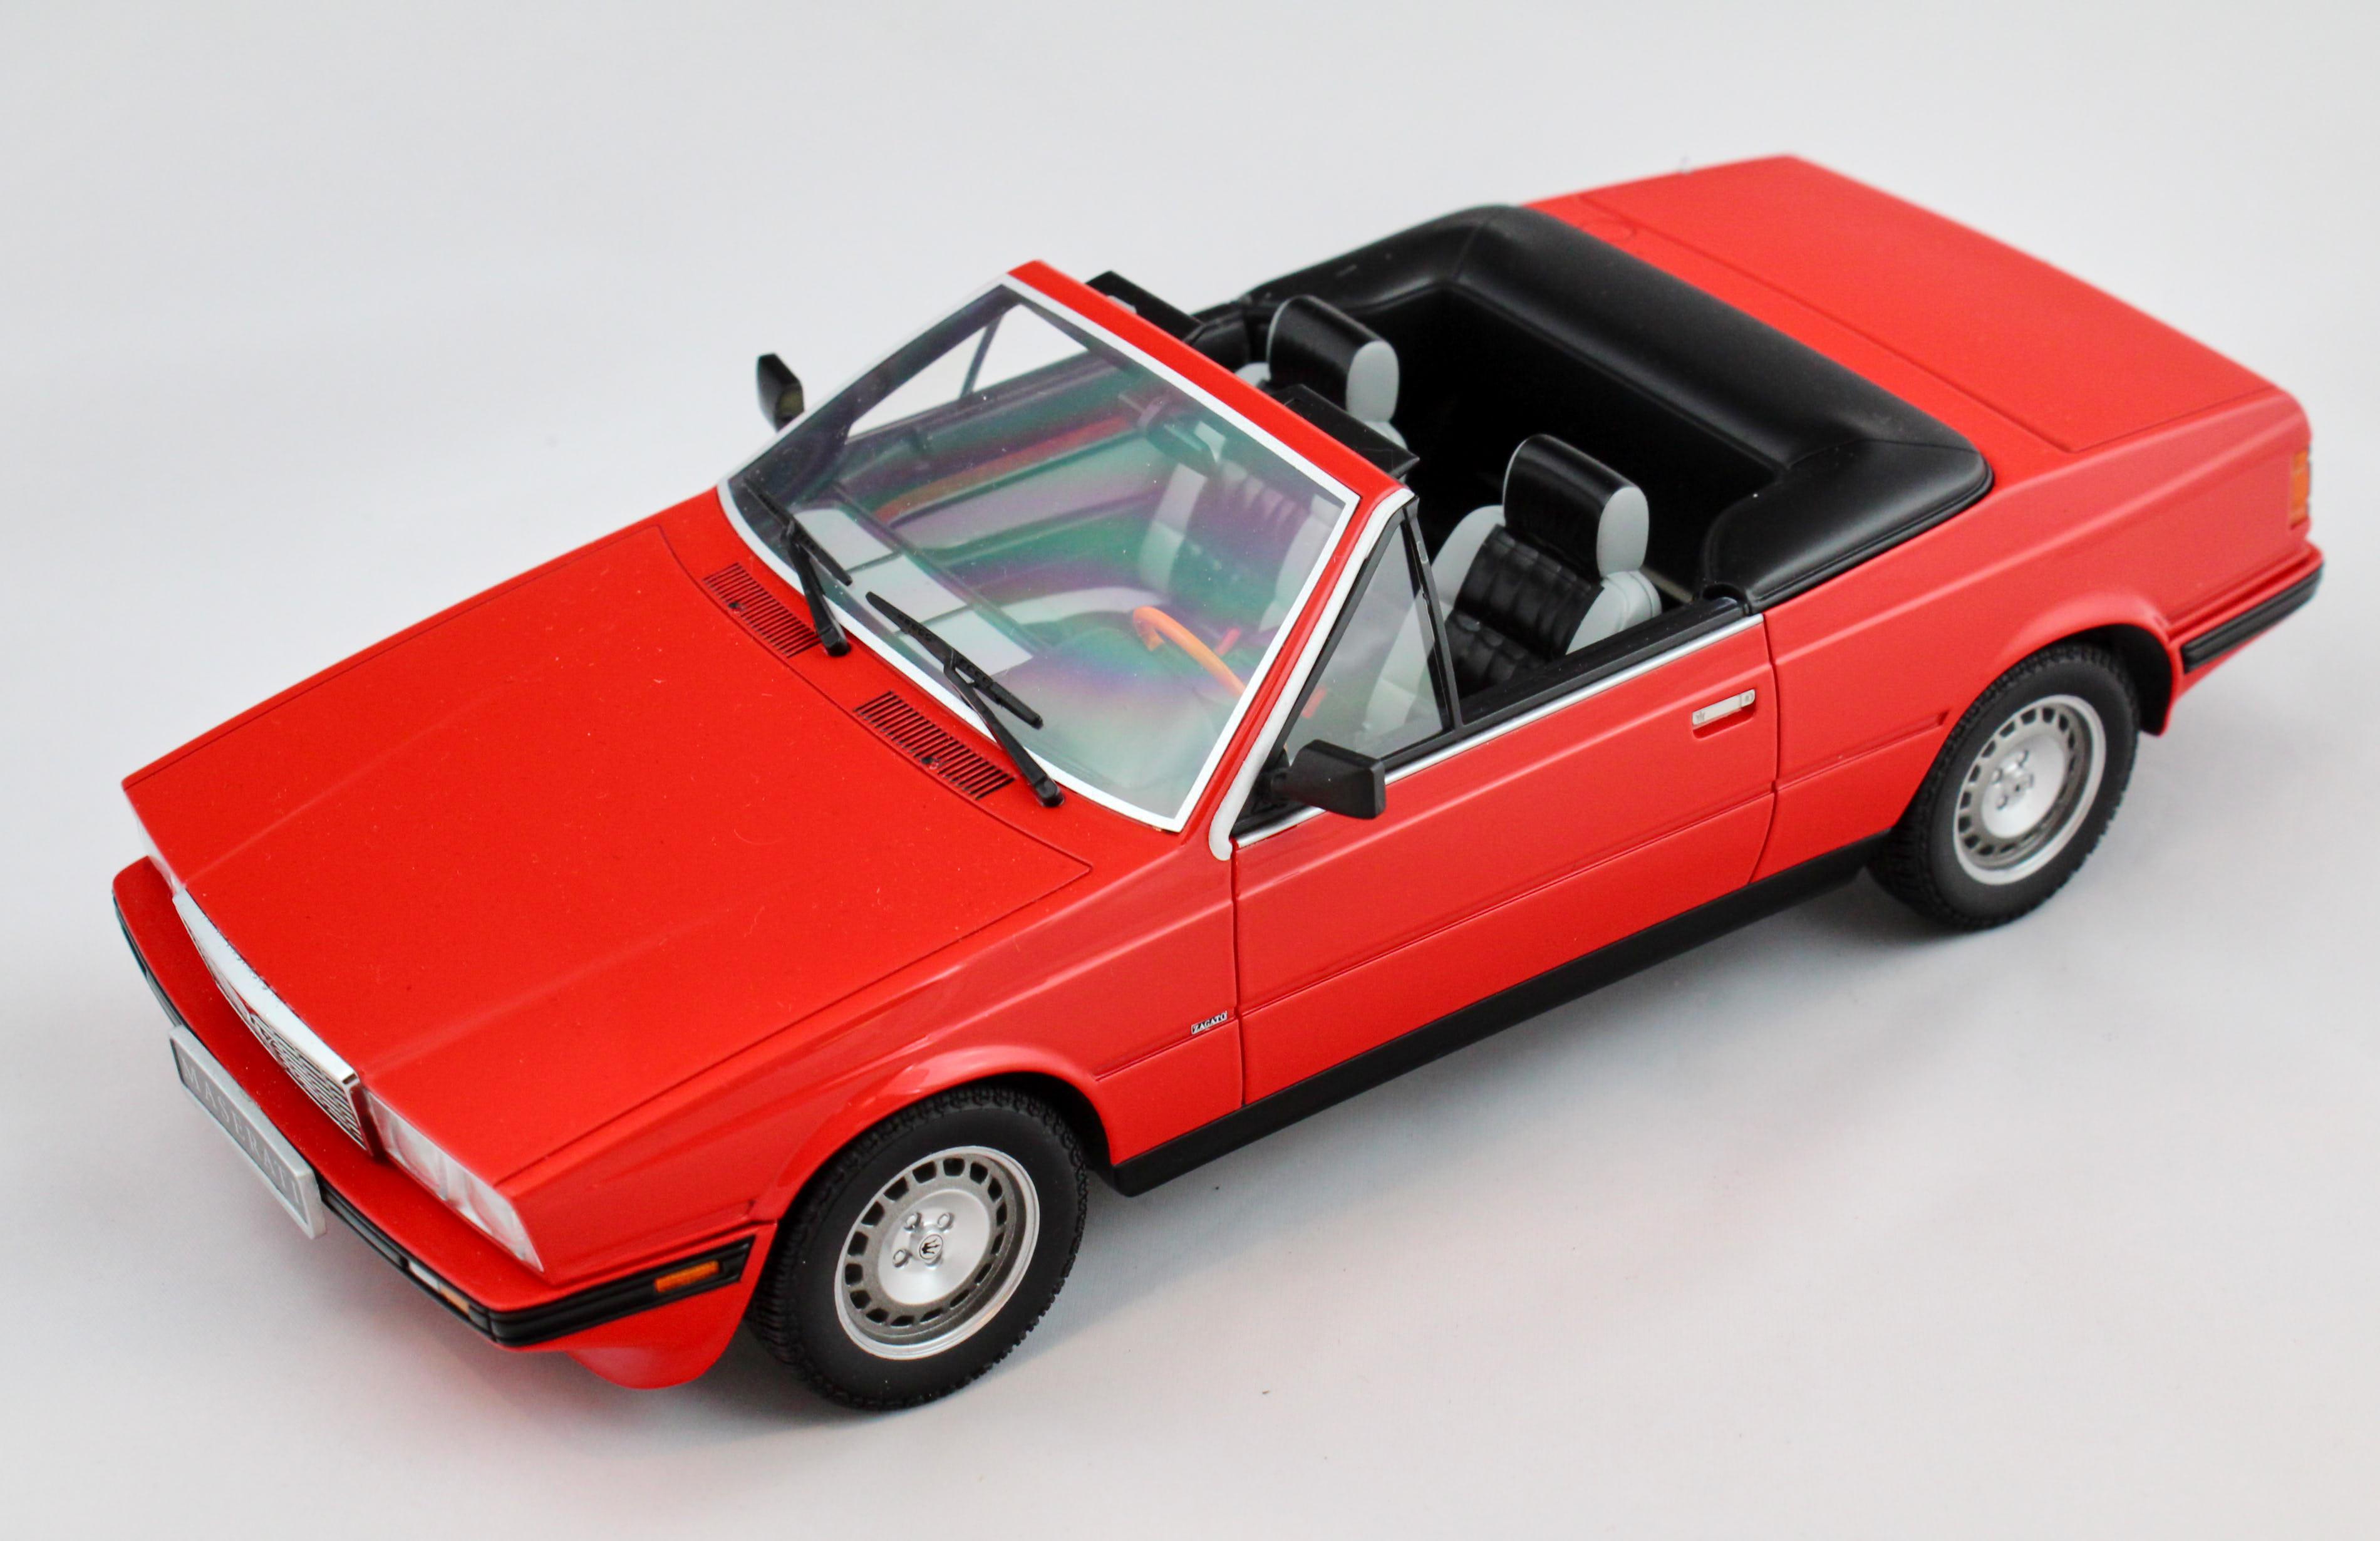 Maserati BiTurbo Spyder 1986 Red 1/18 Minichamps